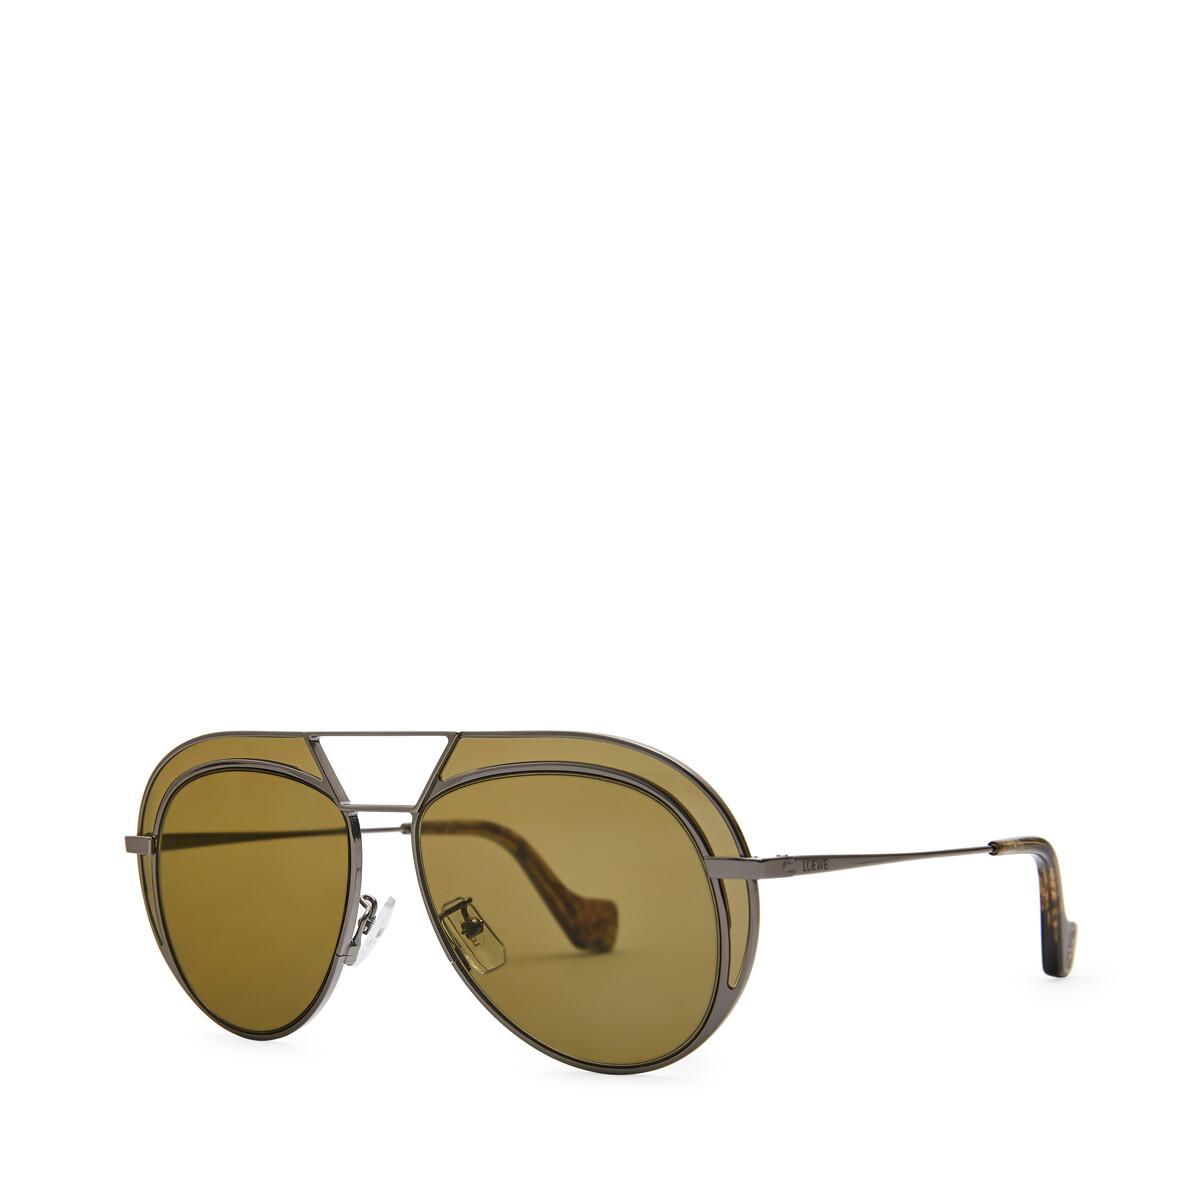 LOEWE Round Metal Sunglasses 黑色/军绿色 front